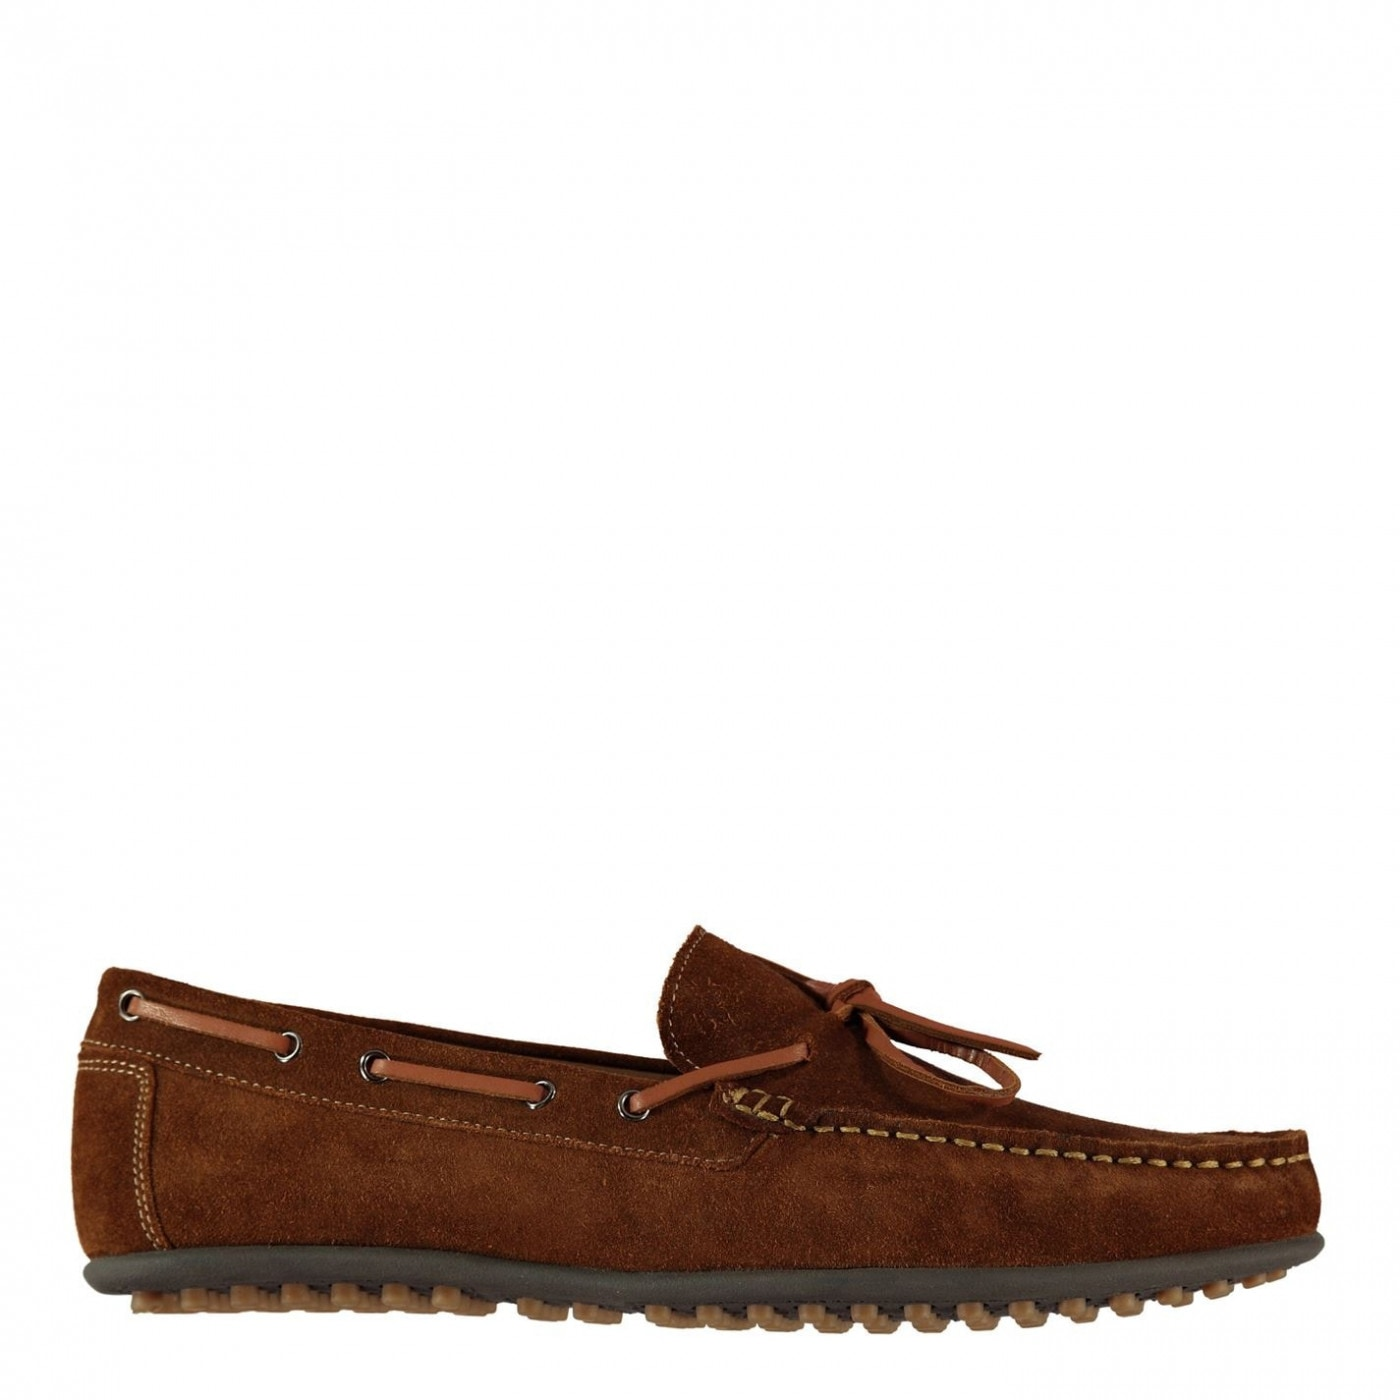 Firetrap Hemsworth Shoes Mens